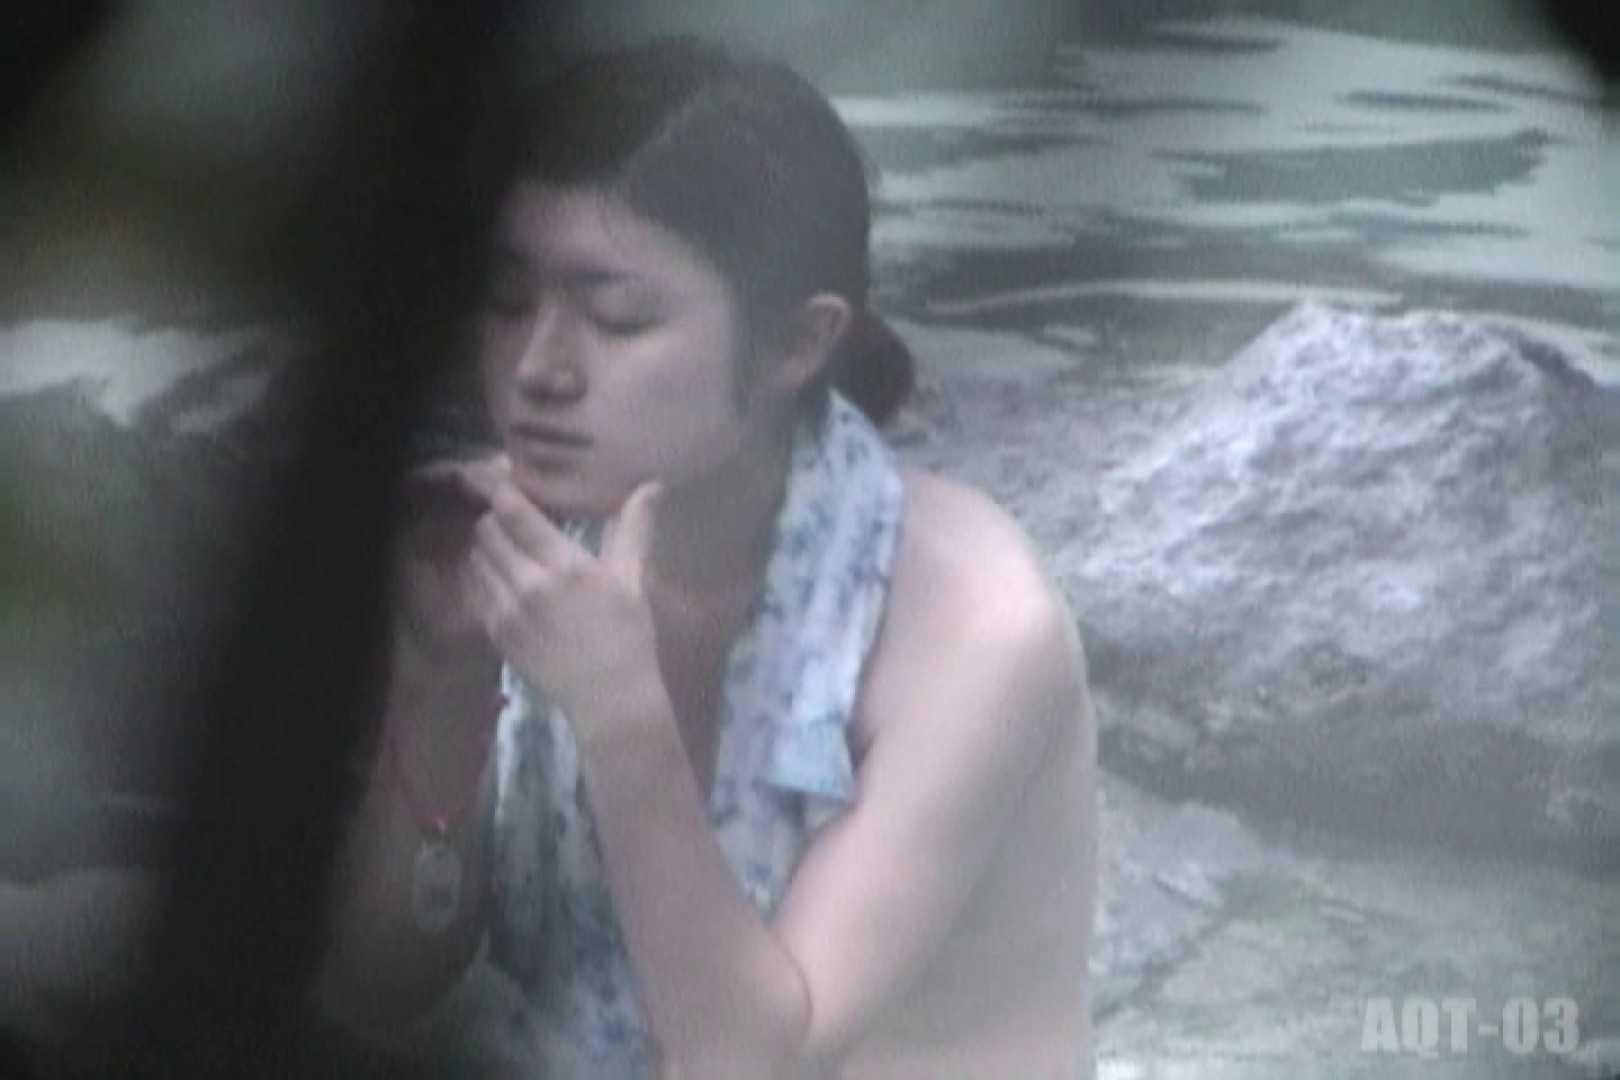 Aquaな露天風呂Vol.736 盗撮シリーズ | 露天風呂編  109PIX 23